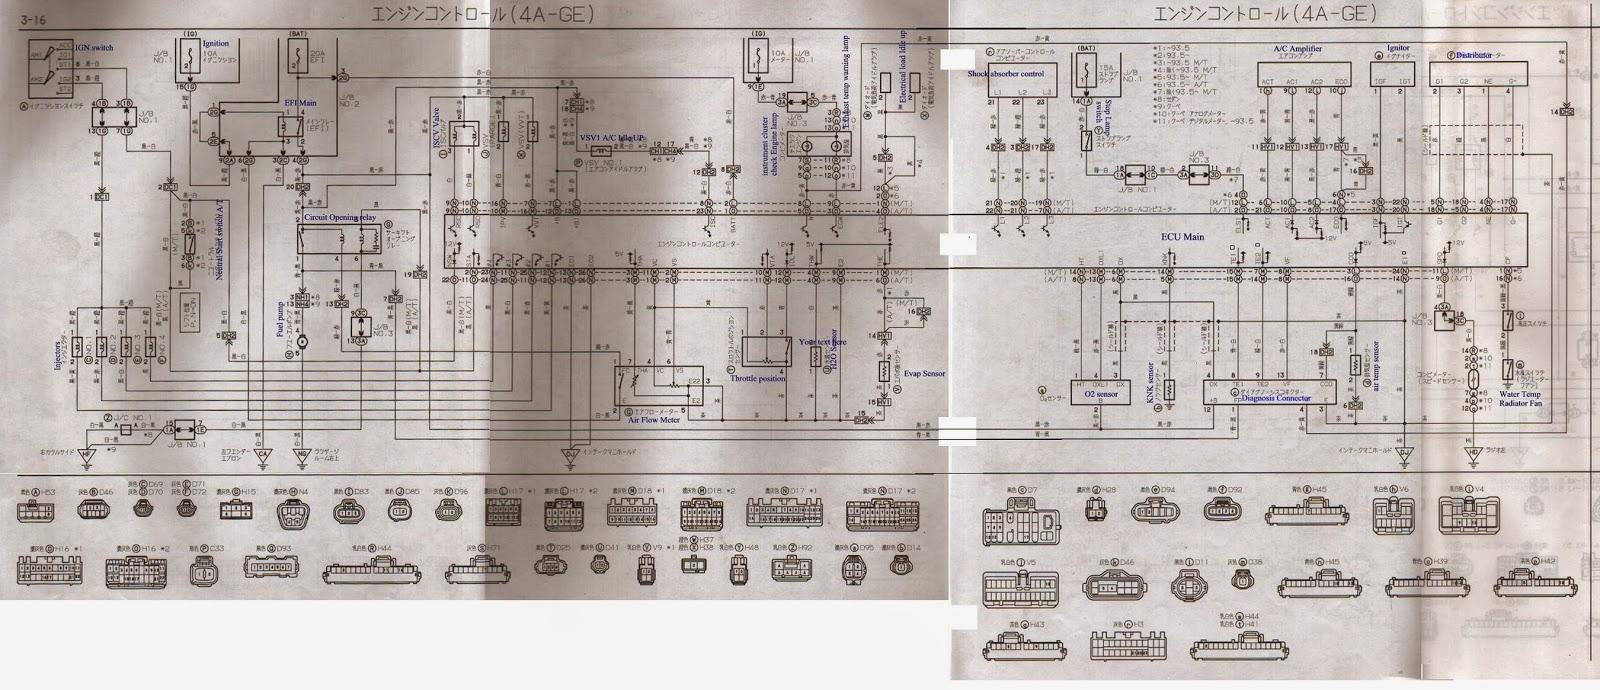 4a ge 20v ae101 ecu pinout wiring diagram [ 1600 x 690 Pixel ]